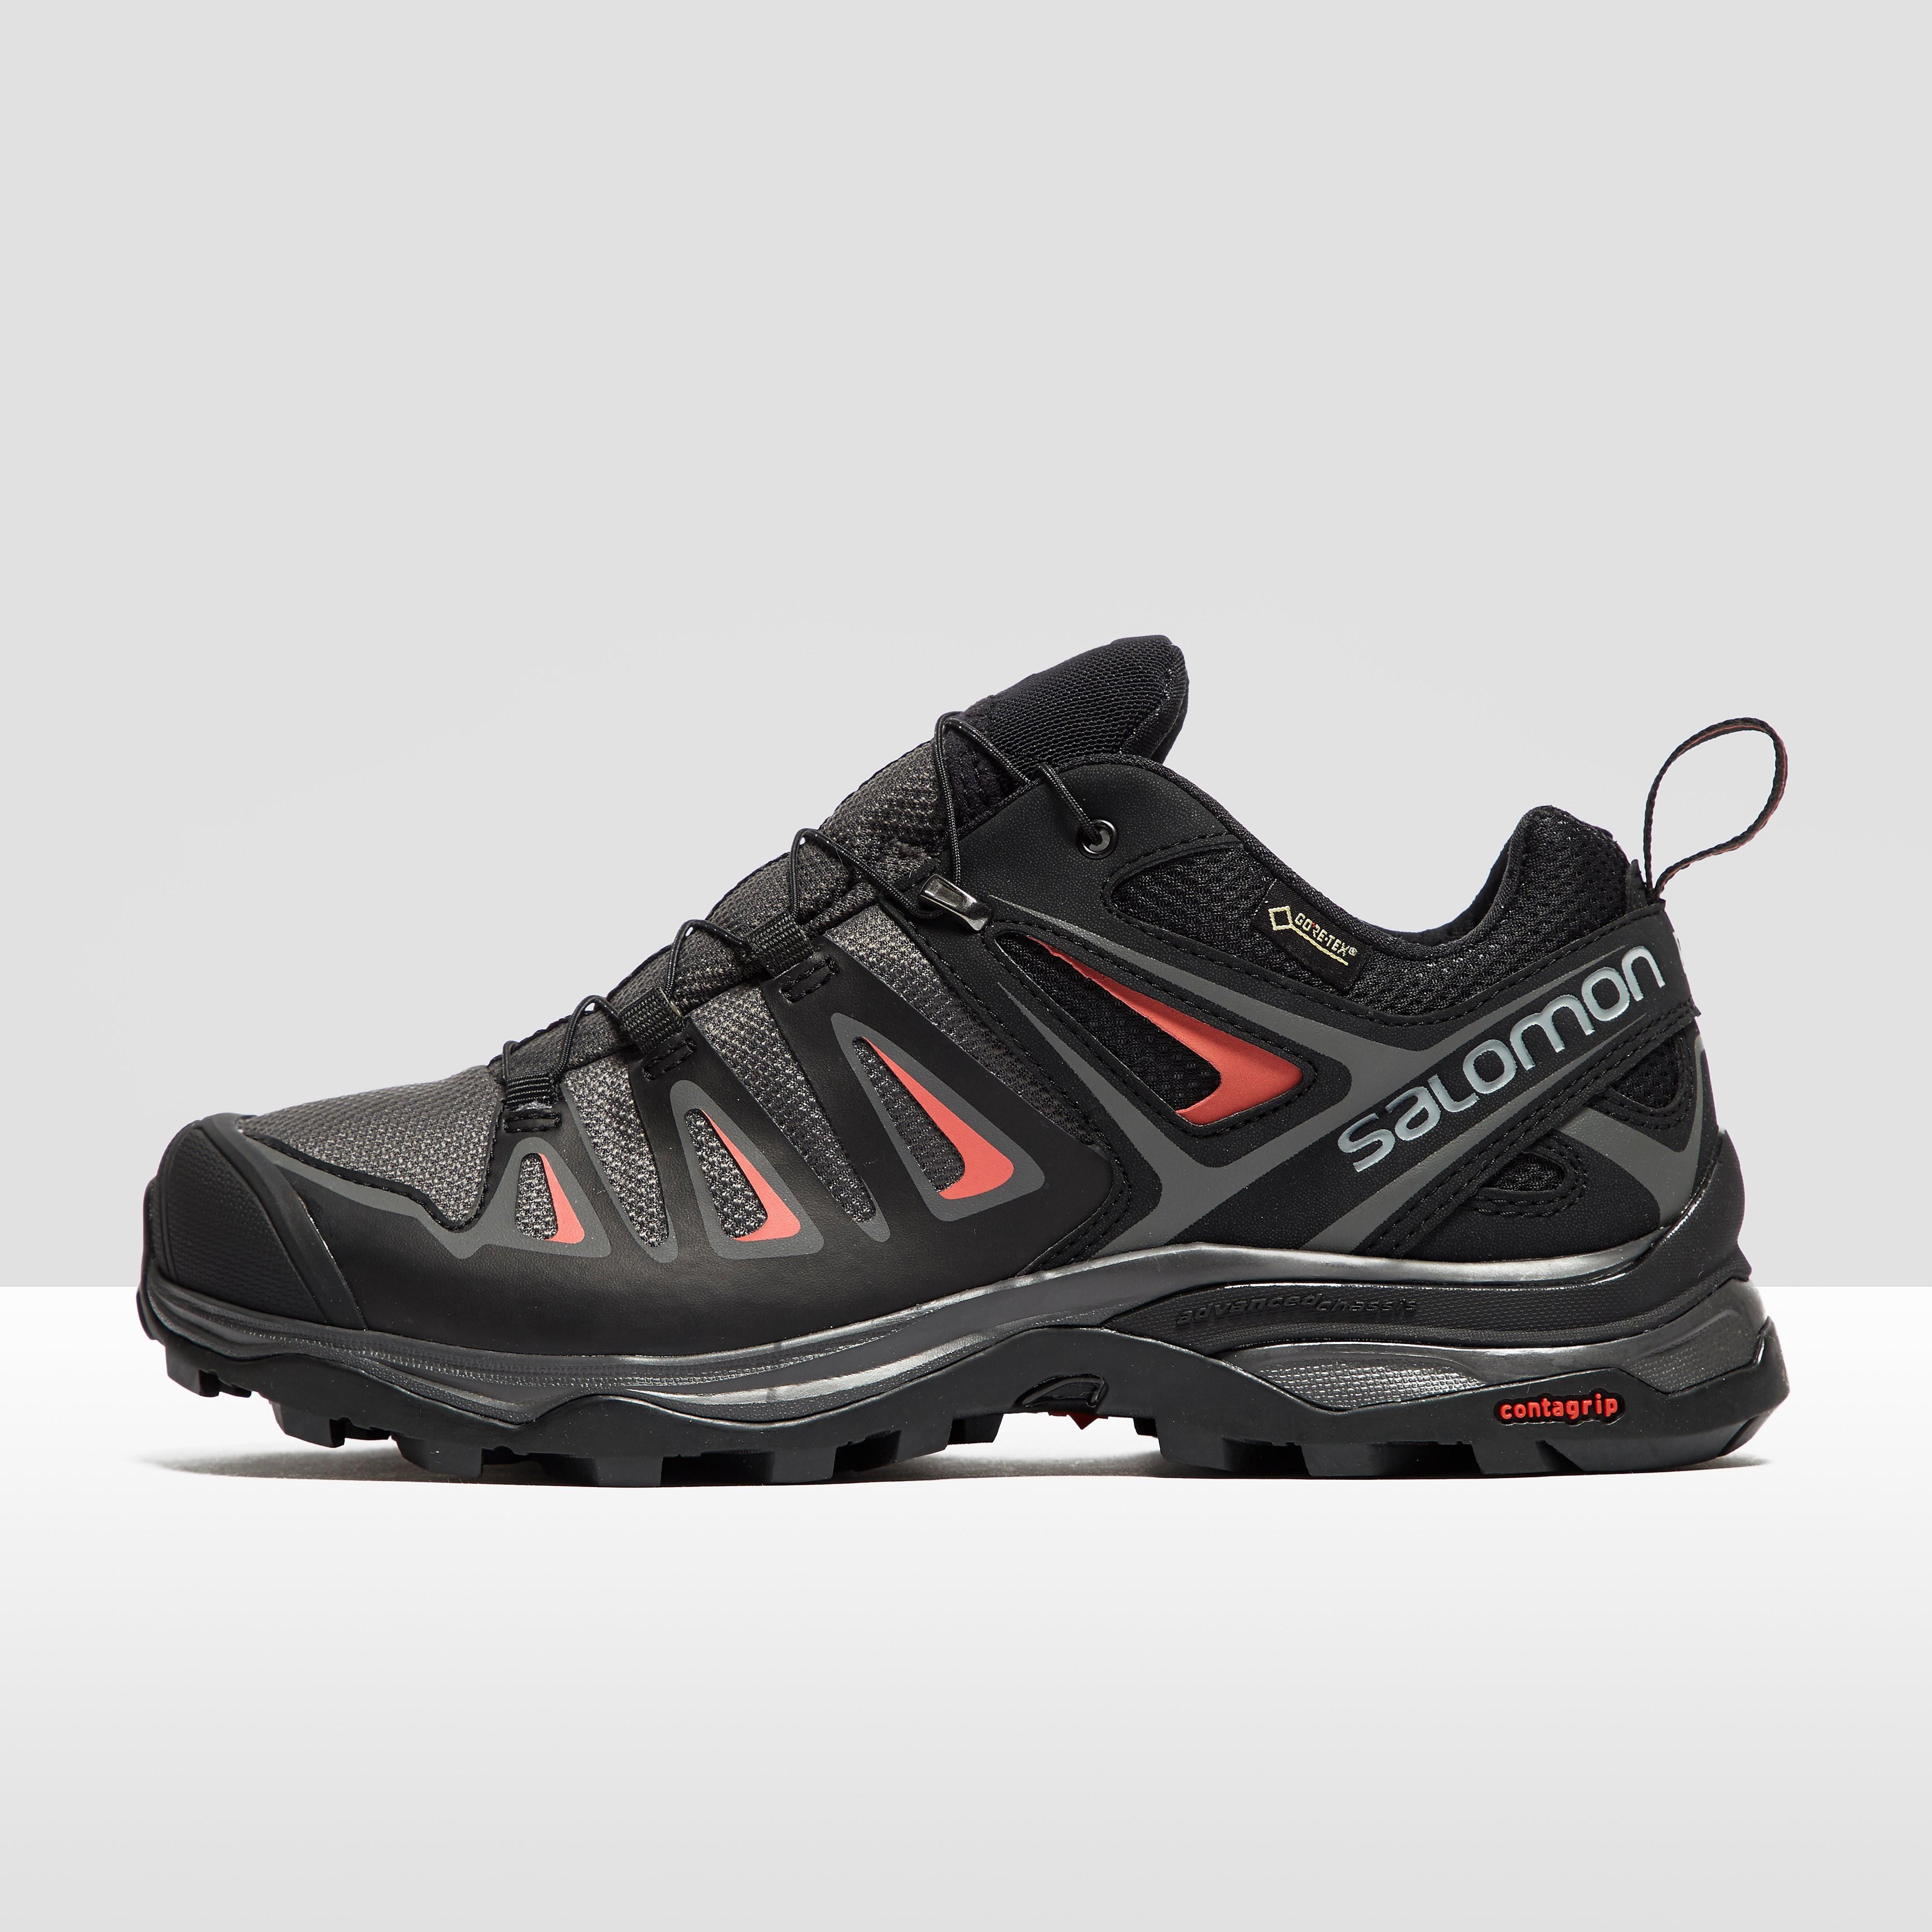 Salomon X ULTRA 3 GTX Women's Walking Shoes